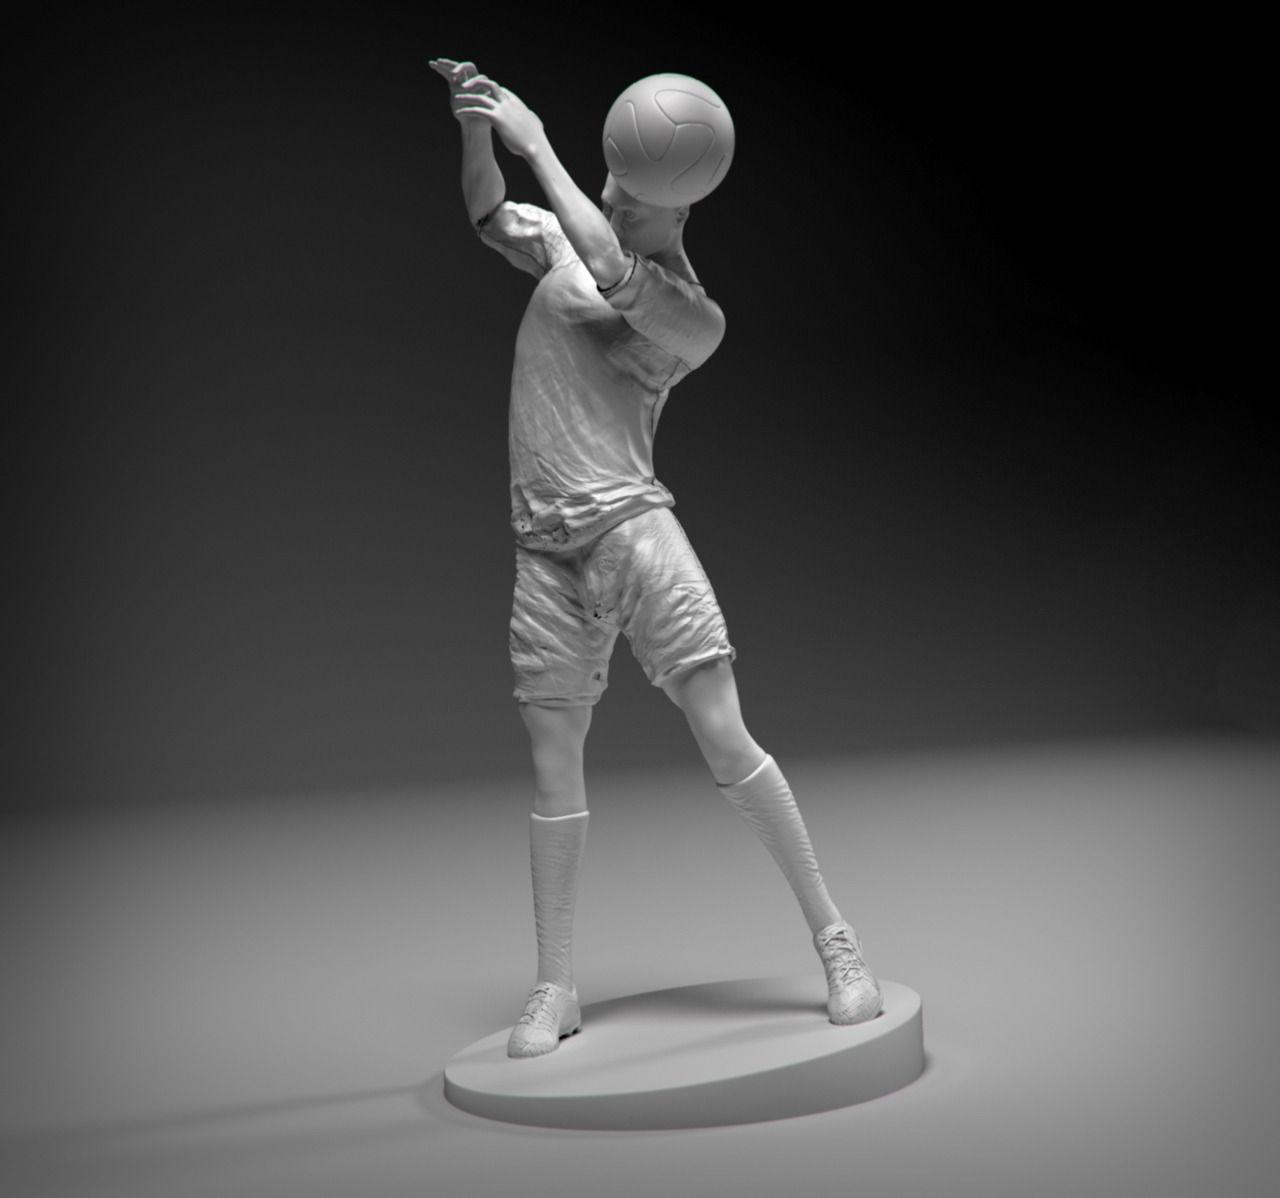 Footballer Headstrike Stl 3D Model 3D Printable STL